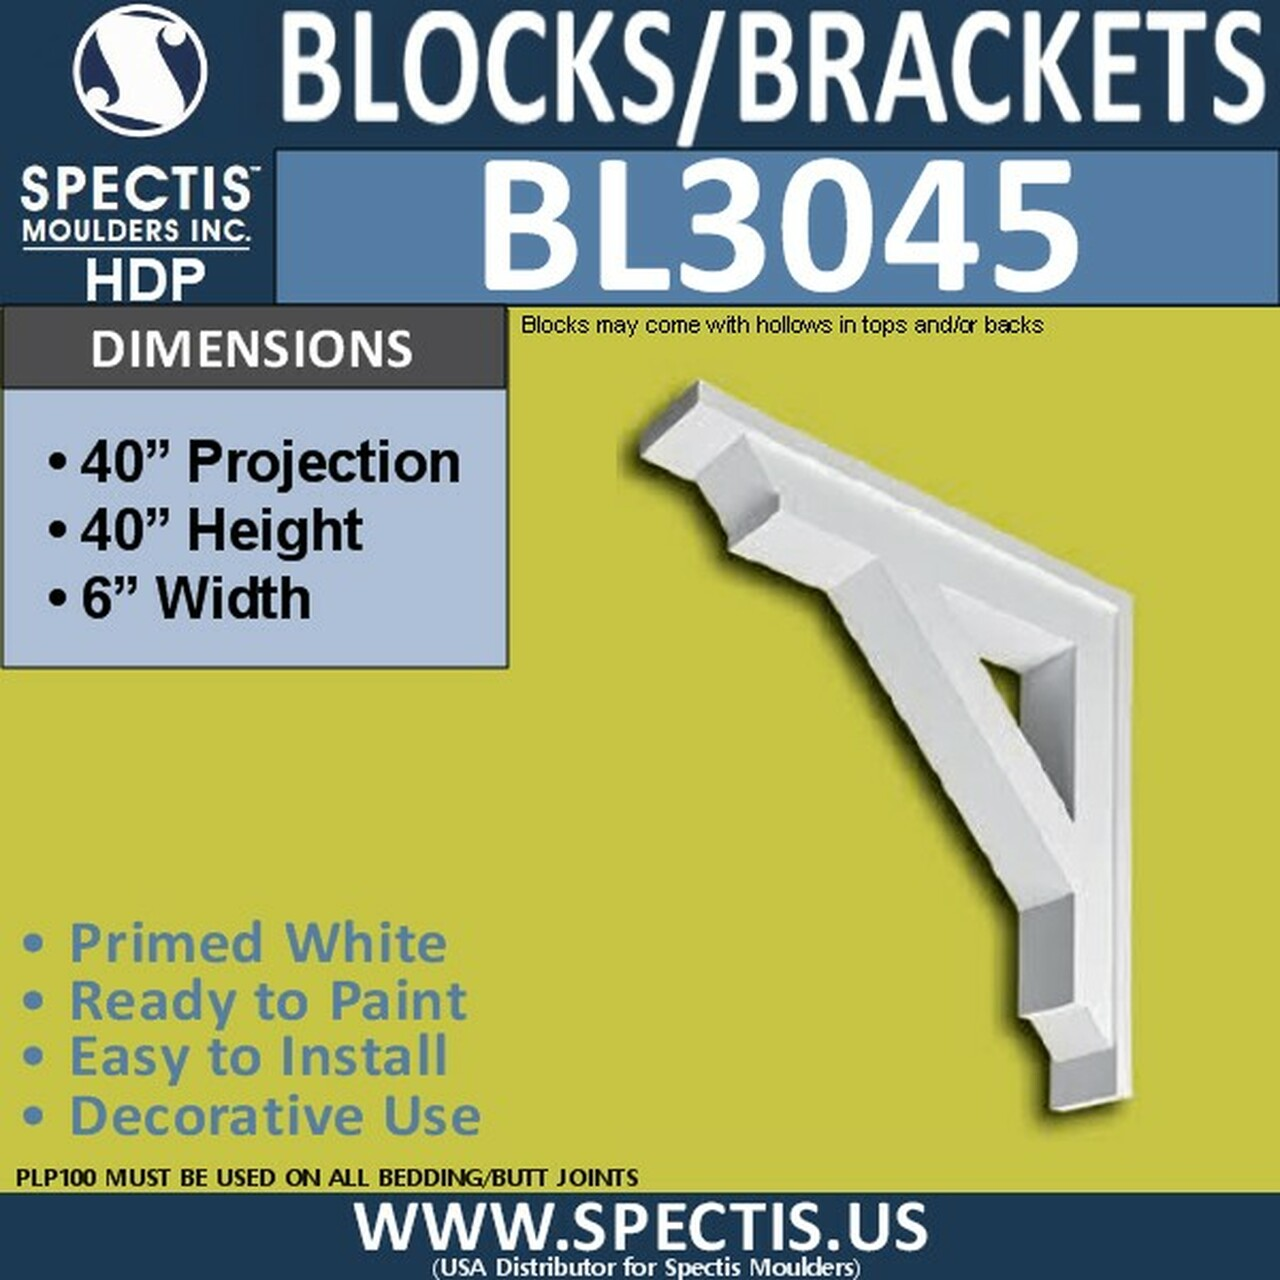 "BL3045 Eave Block or Bracket 6""W x 40""H x 40"" P"